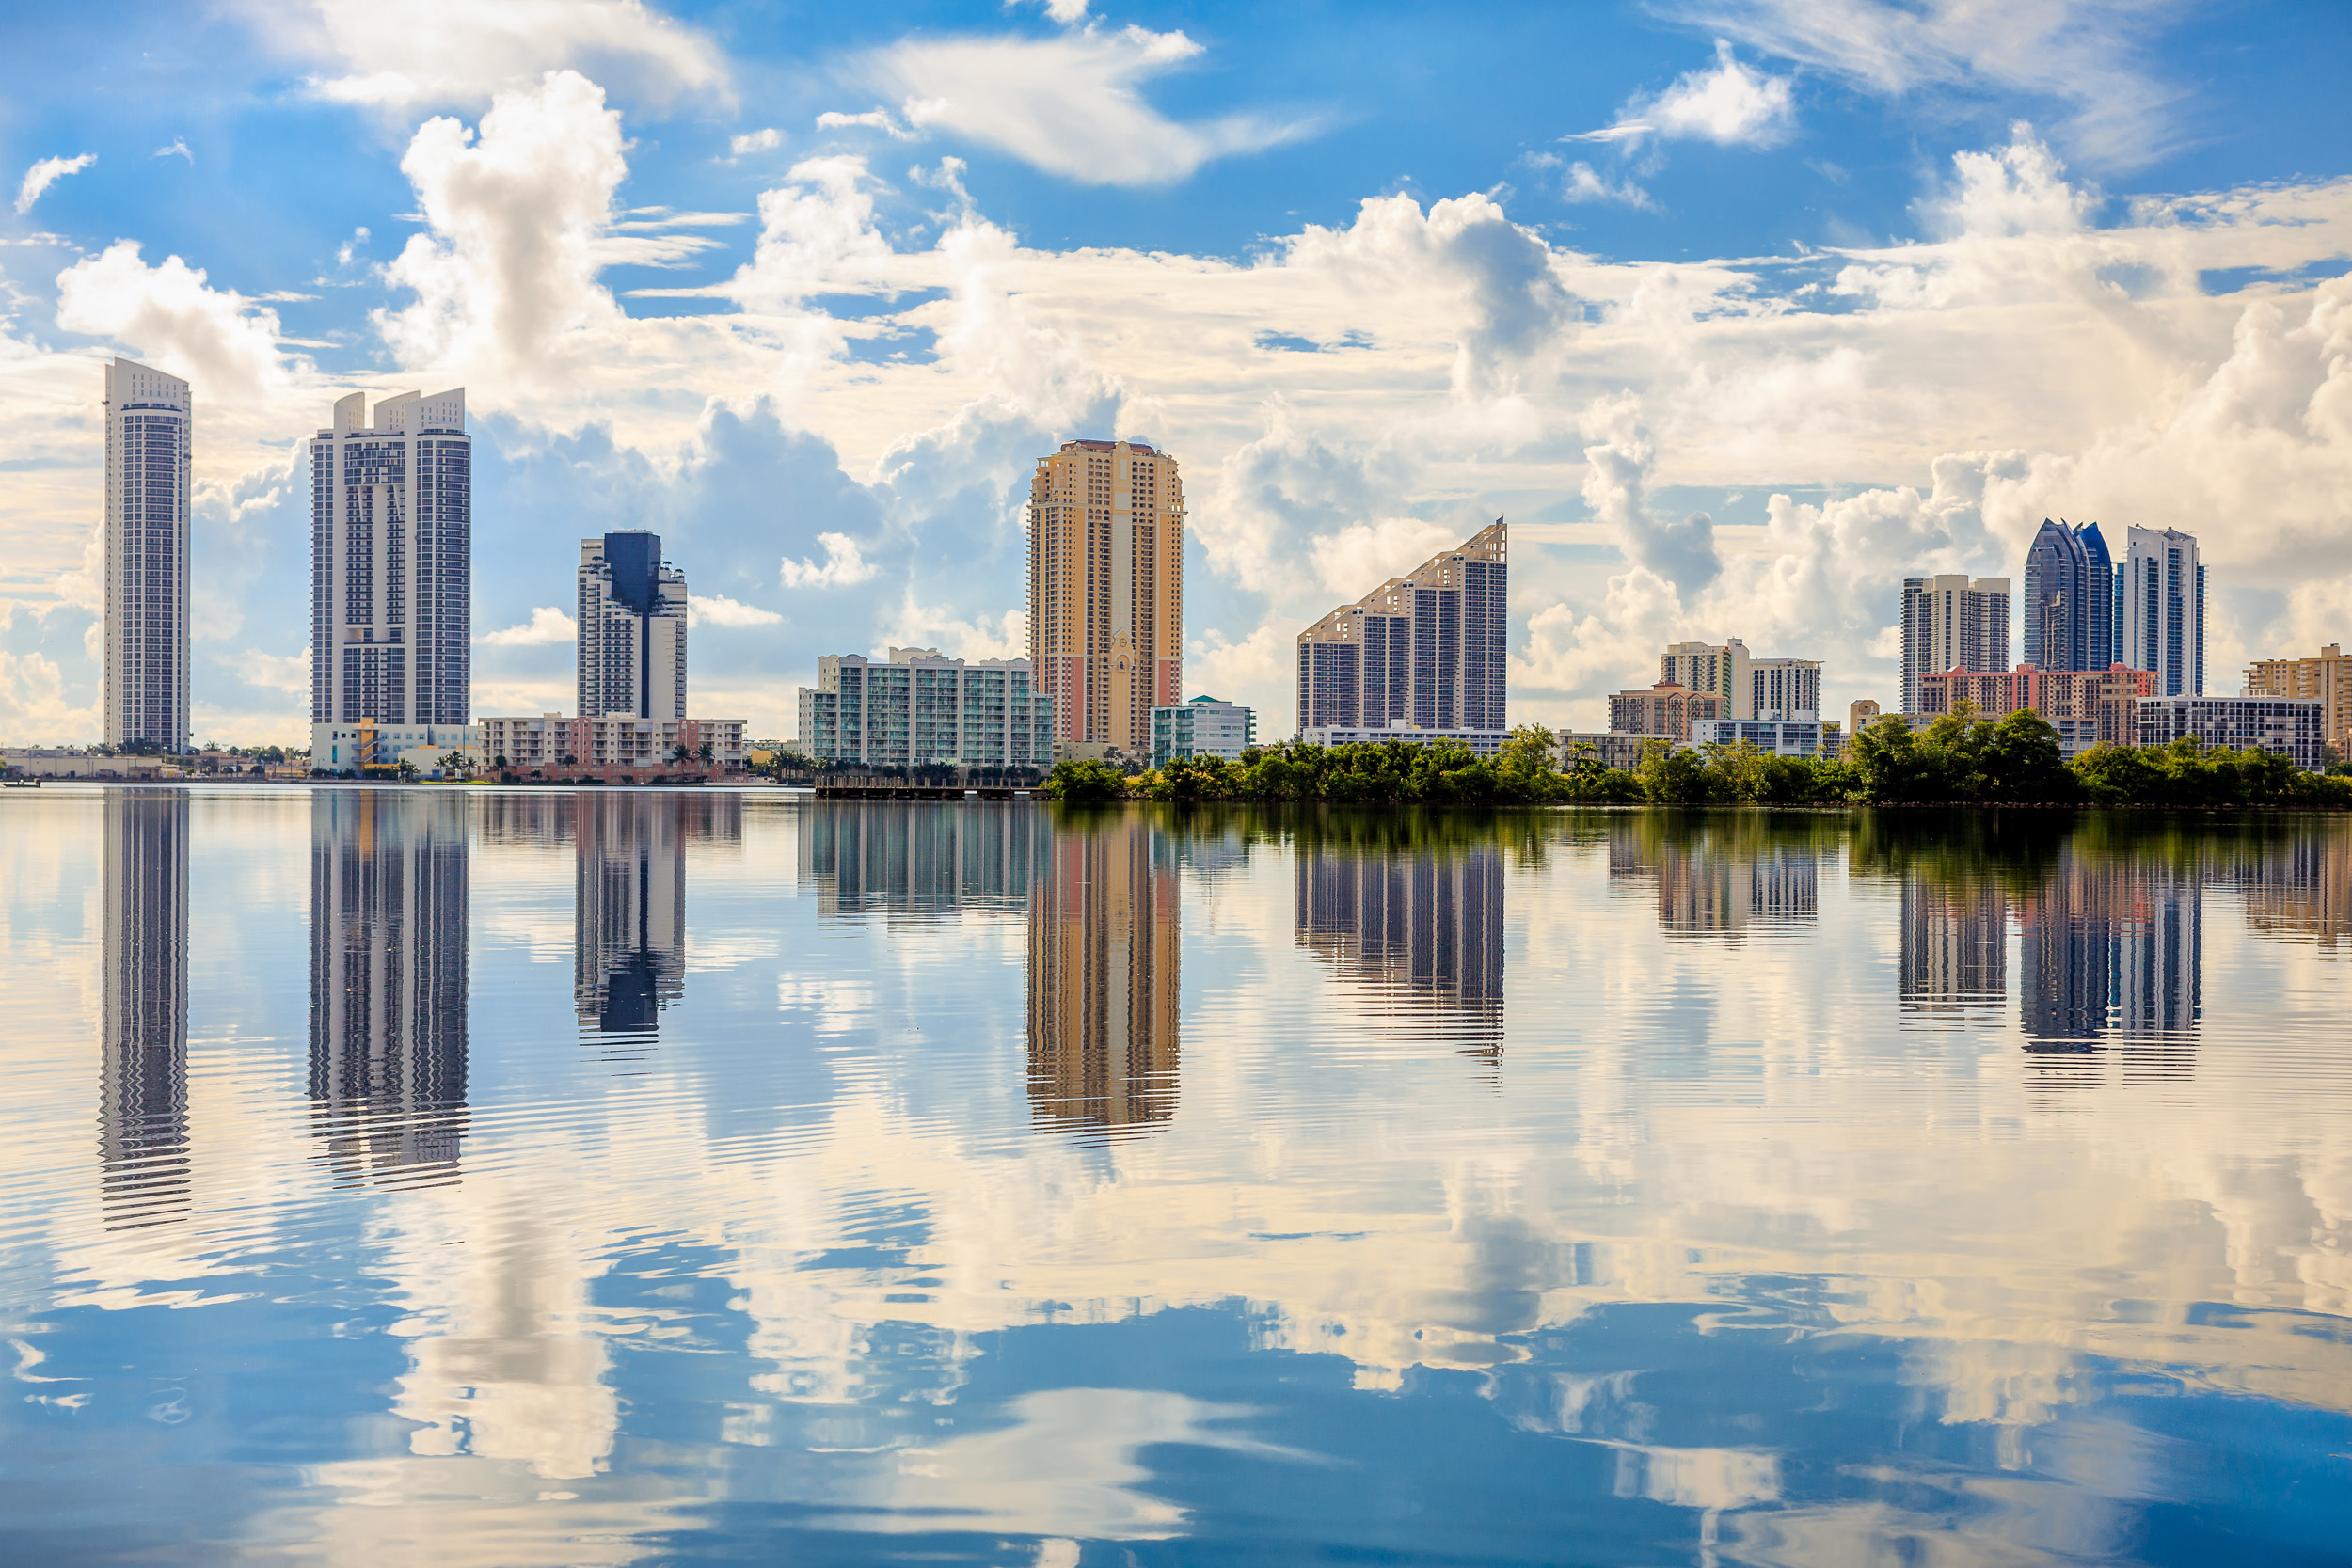 Sunny_Isles_skyline_reflection_Miami_Fort_Lauderdale_commercial_photographer_Franklin_Castillo.jpg